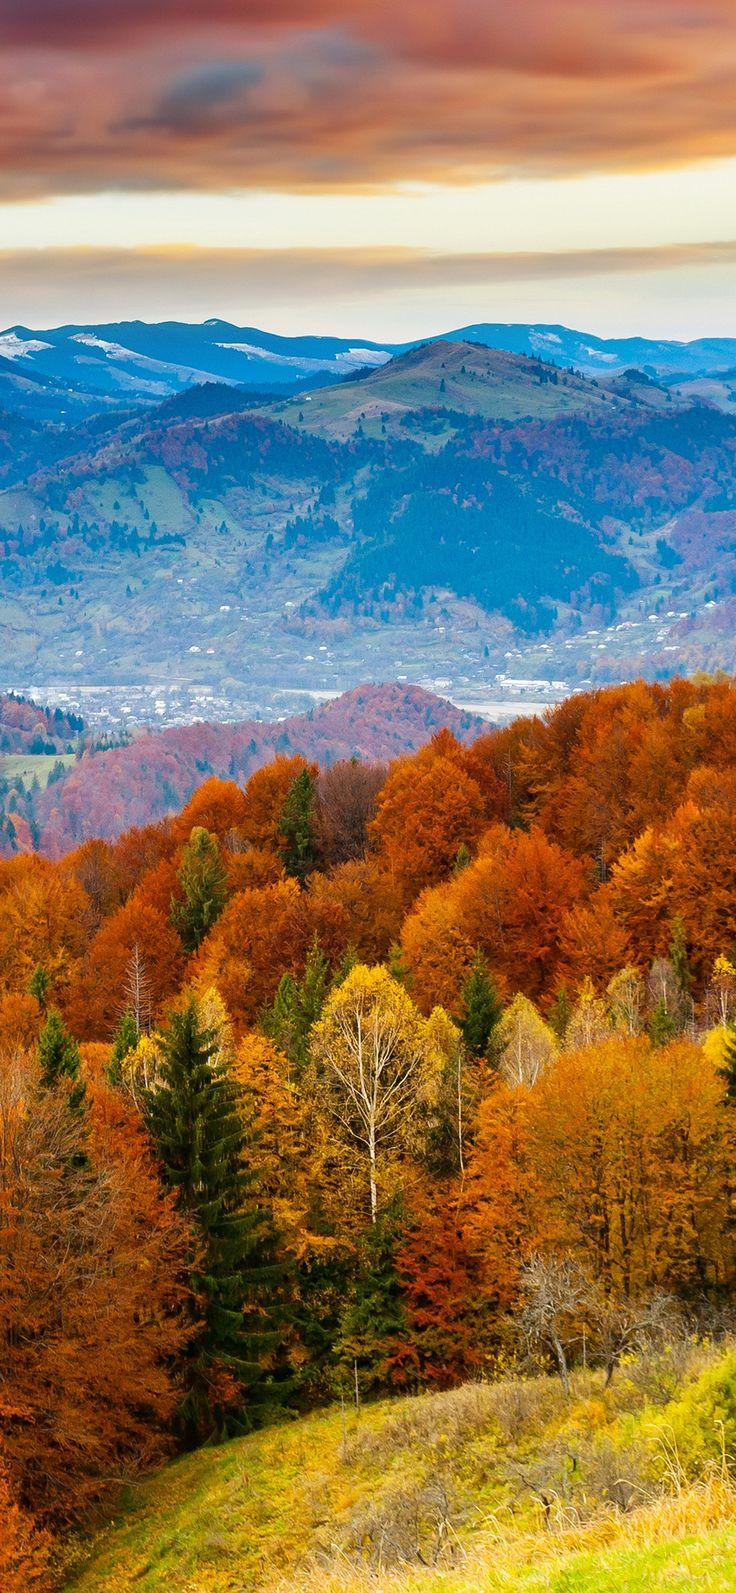 Fall mountain | Iphone wallpaper fall, Fall wallpaper ...